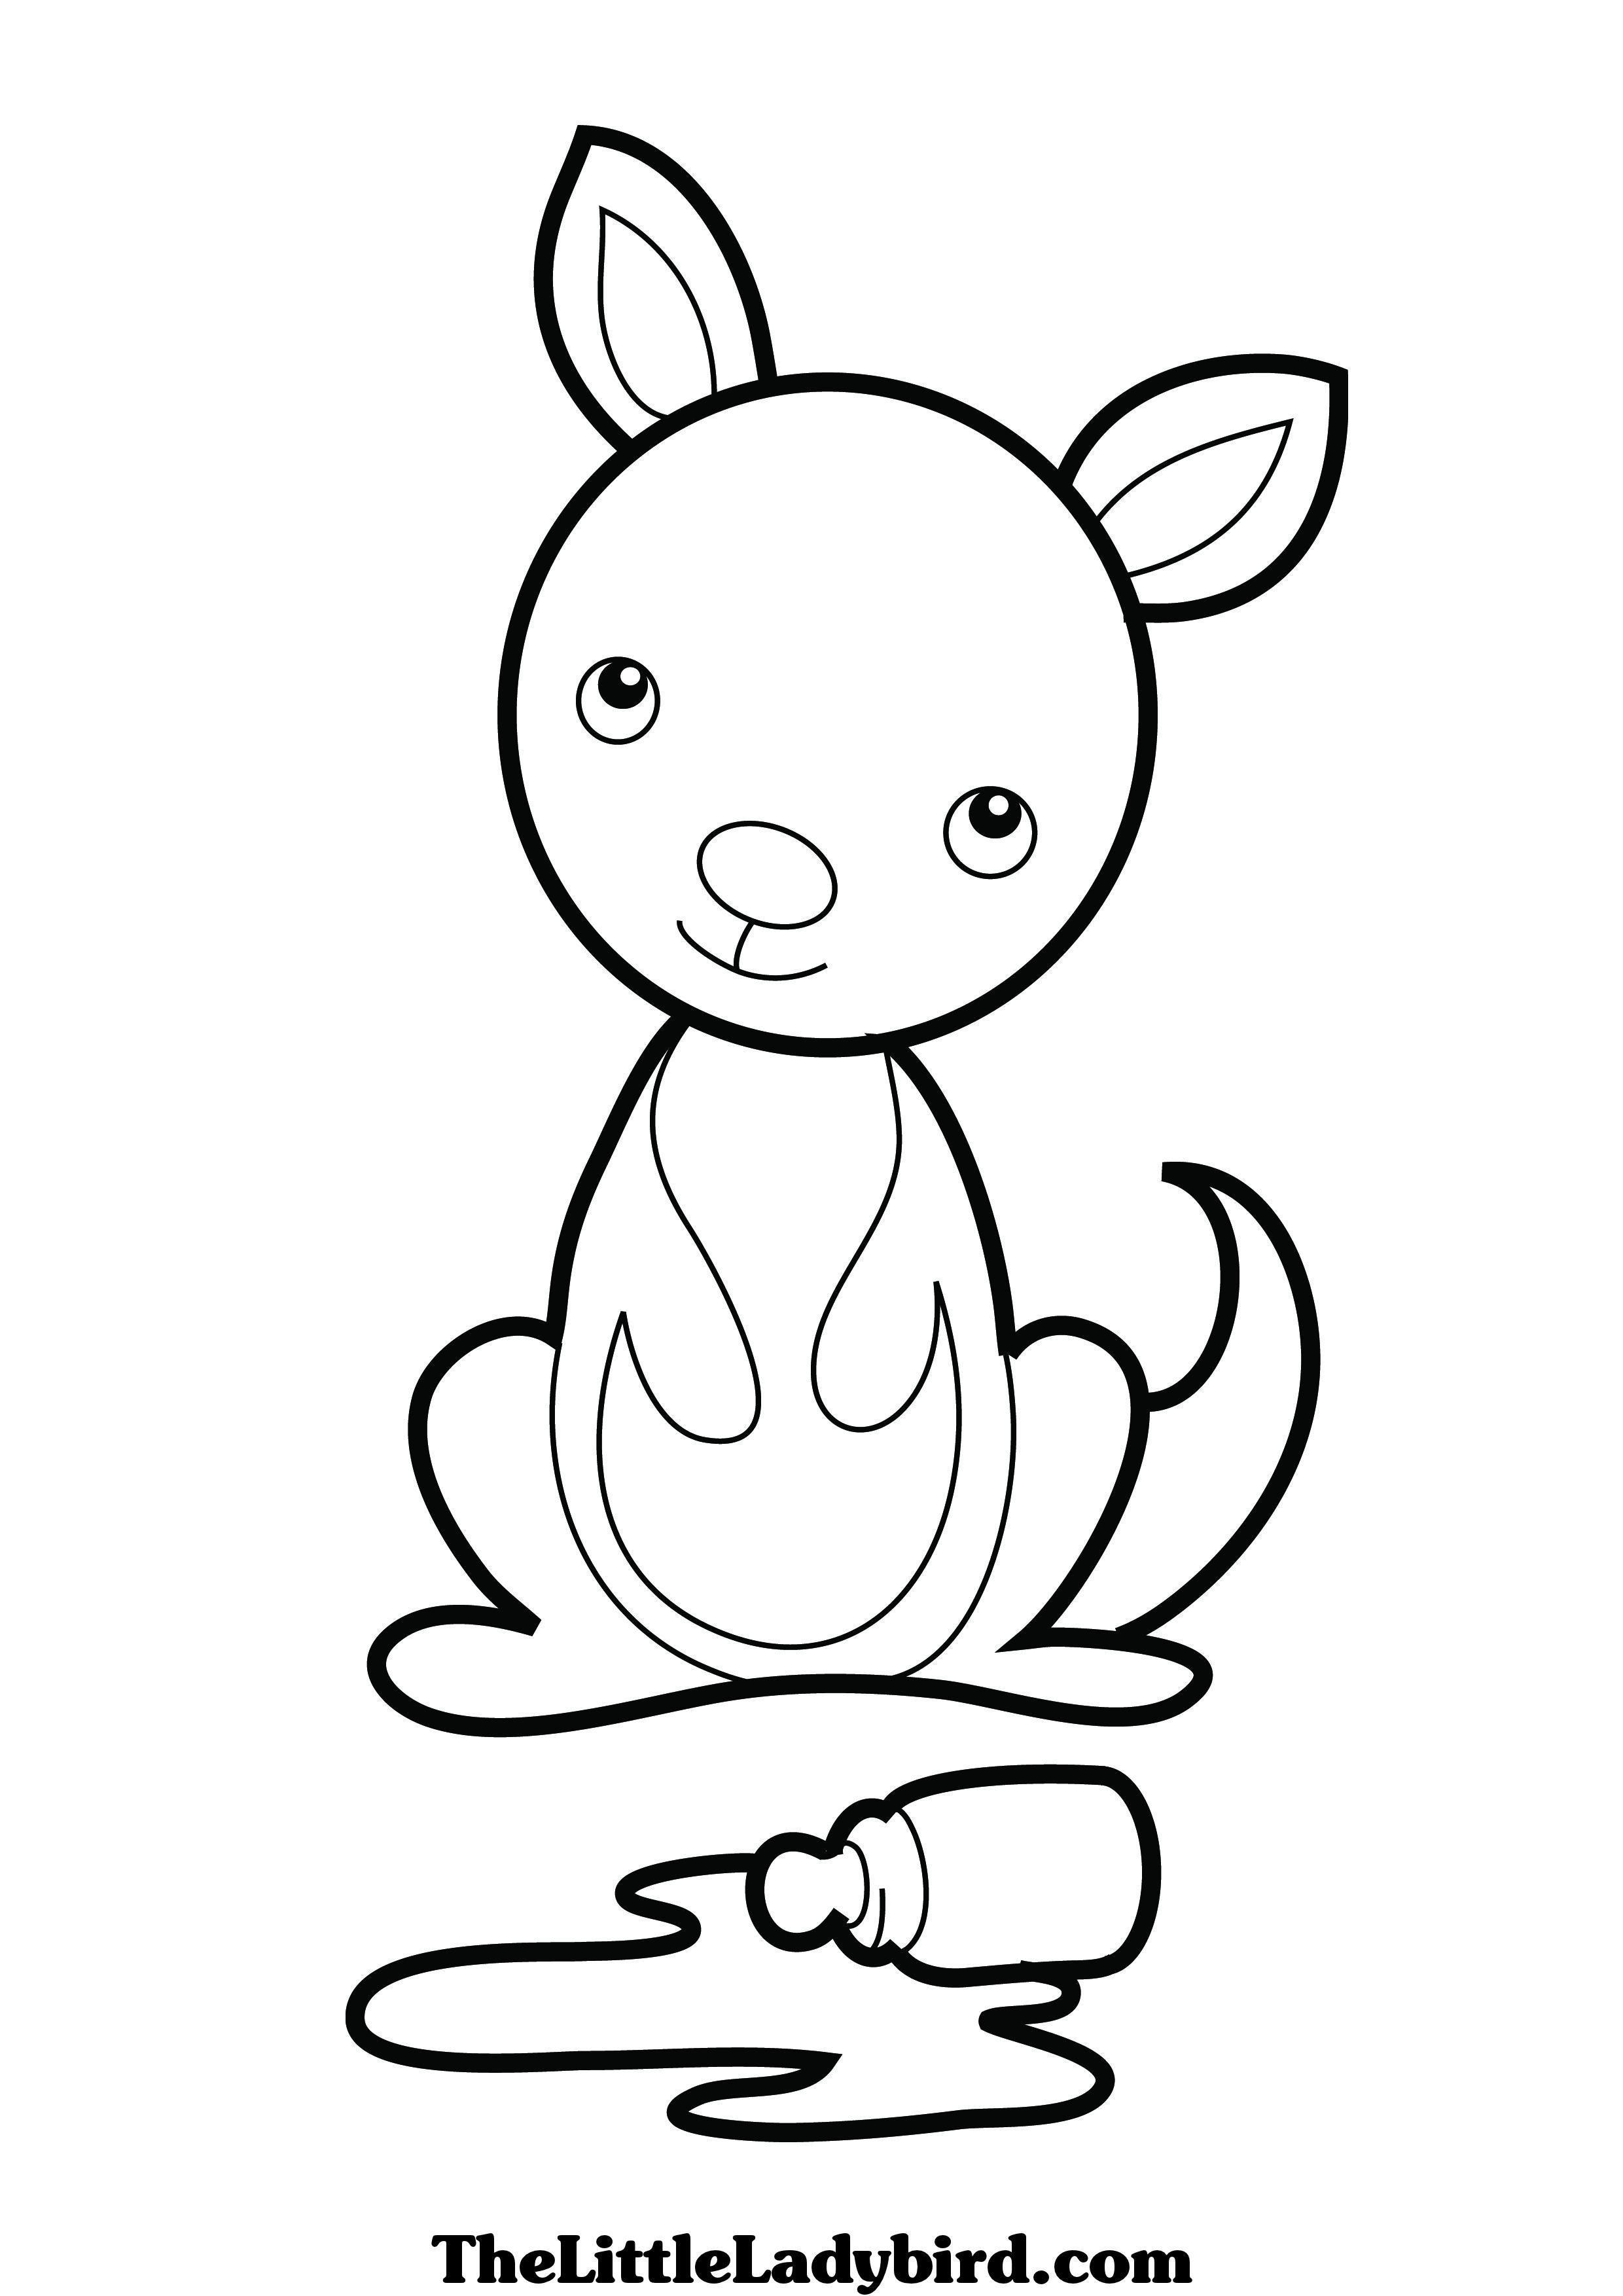 Https Bsaffunktaking Blogspot Com 2019 04 Free Animals Coloring Pages Html Kangaroo Coloring Page Bear Coloring Pages Animal Coloring Pages